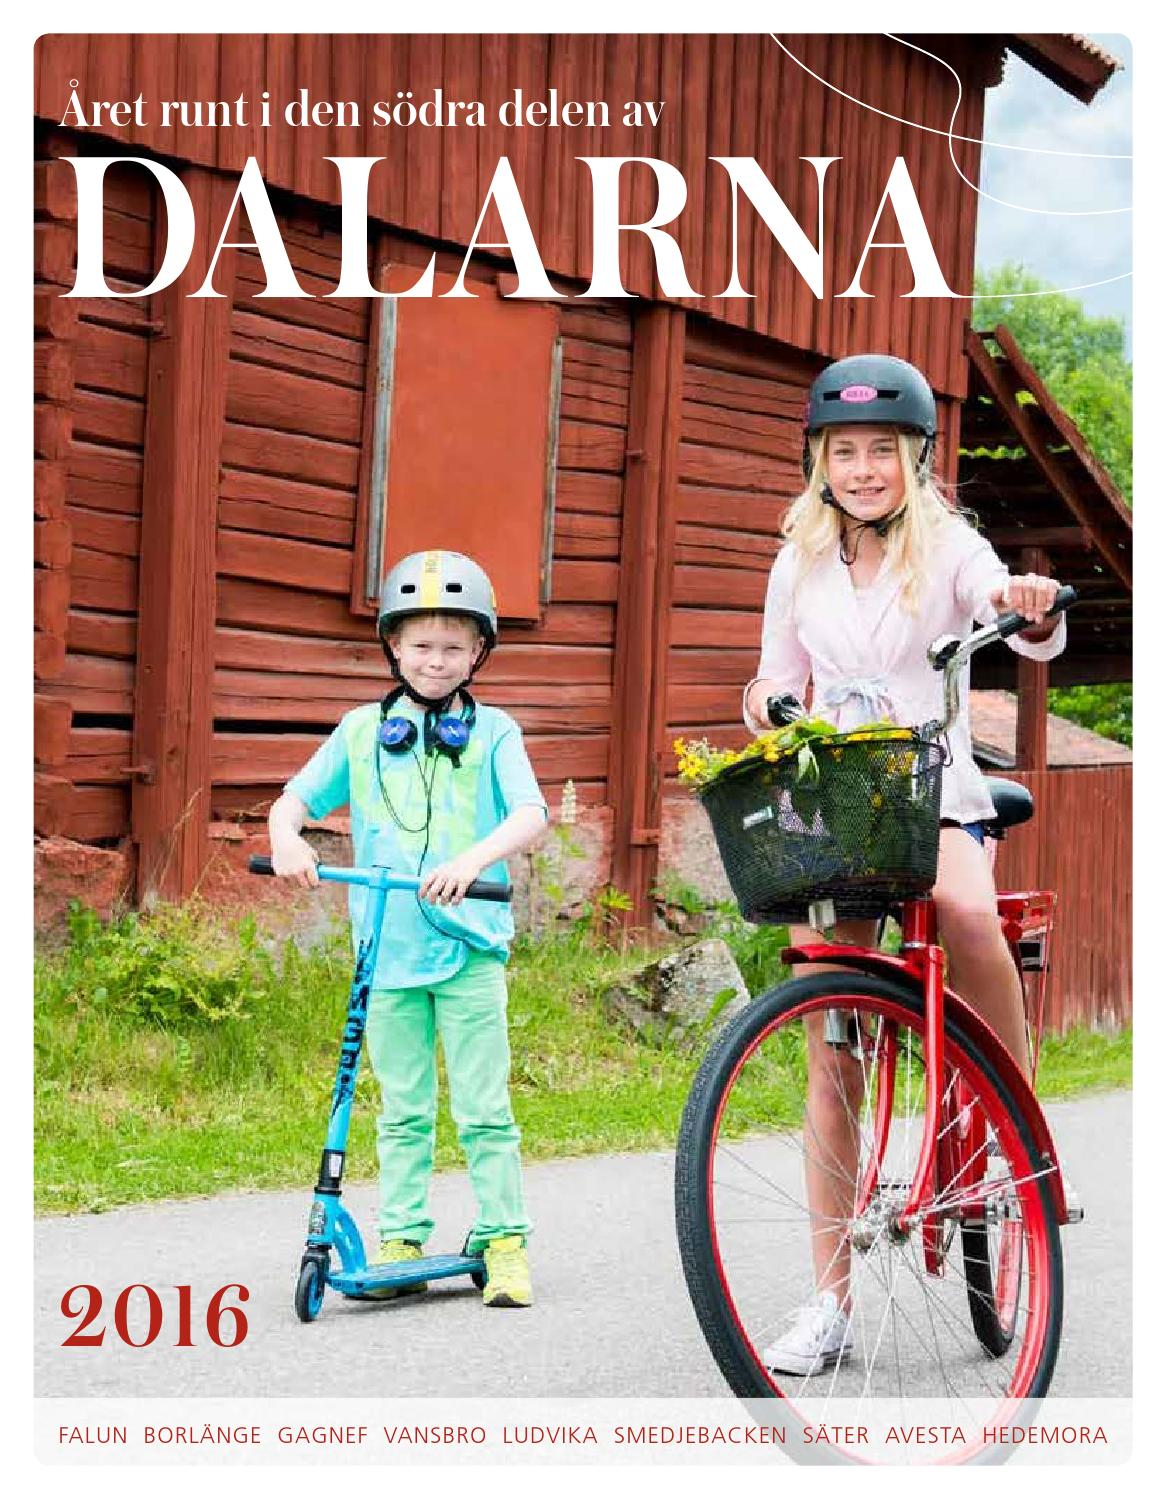 turistbroschyr s246dra dalarna 2016 by visit s246dra dalarna